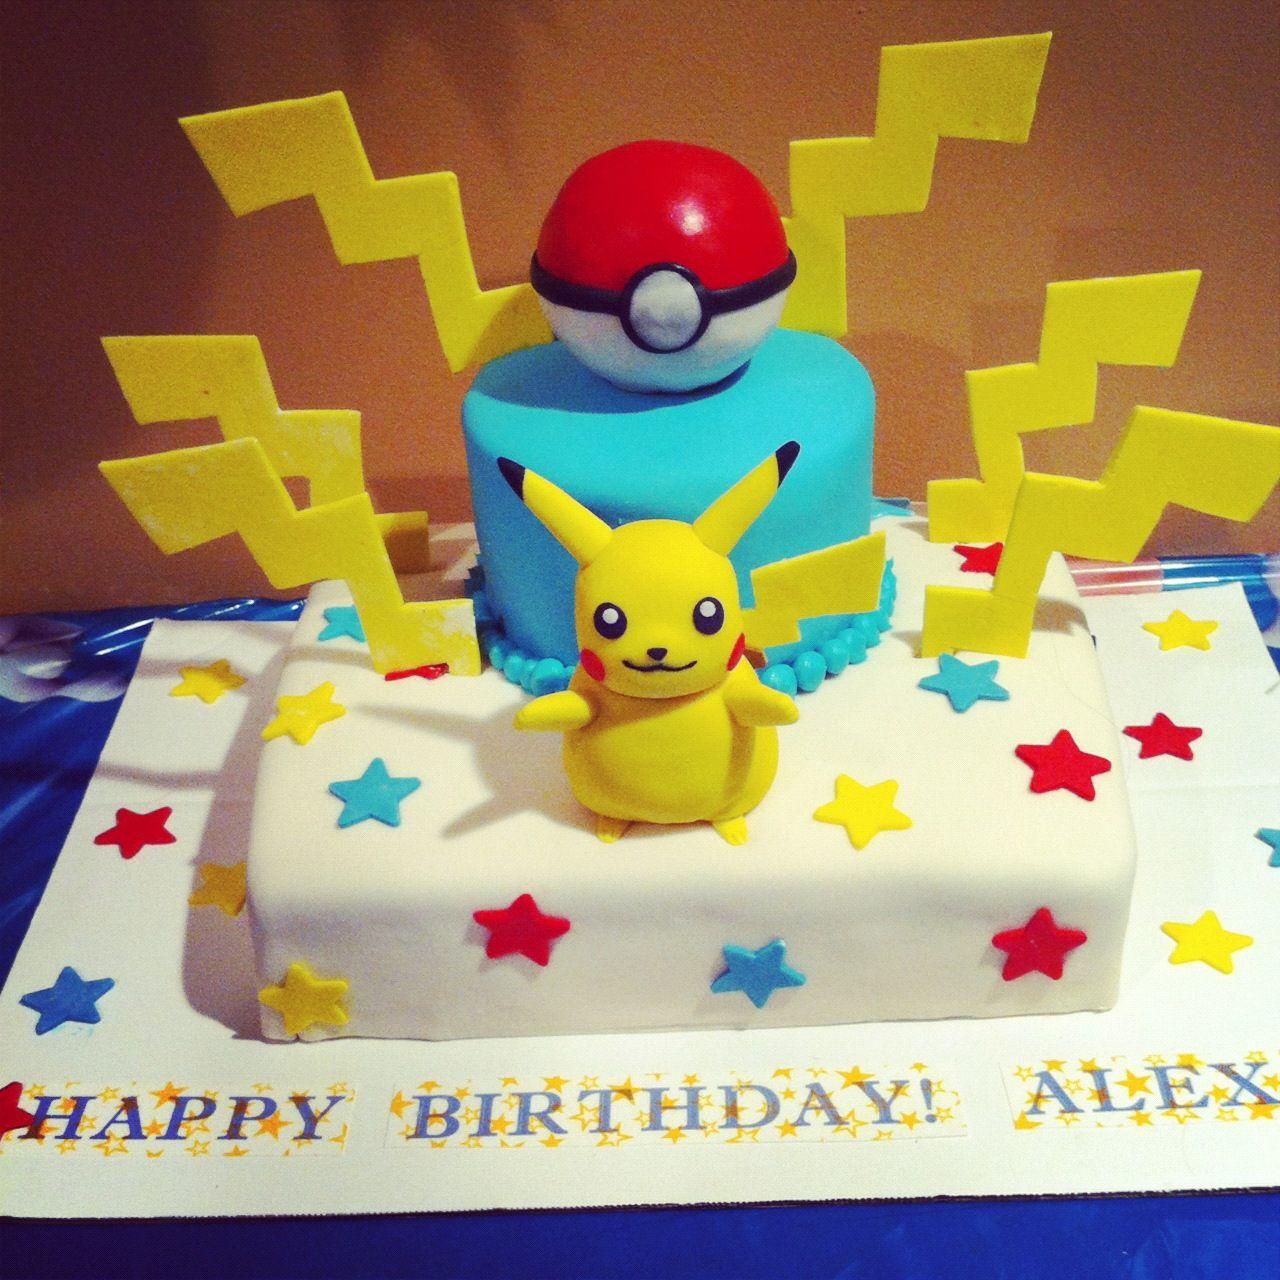 small pokemon cake ideas 52745 pokemon cake decorations ca. Black Bedroom Furniture Sets. Home Design Ideas